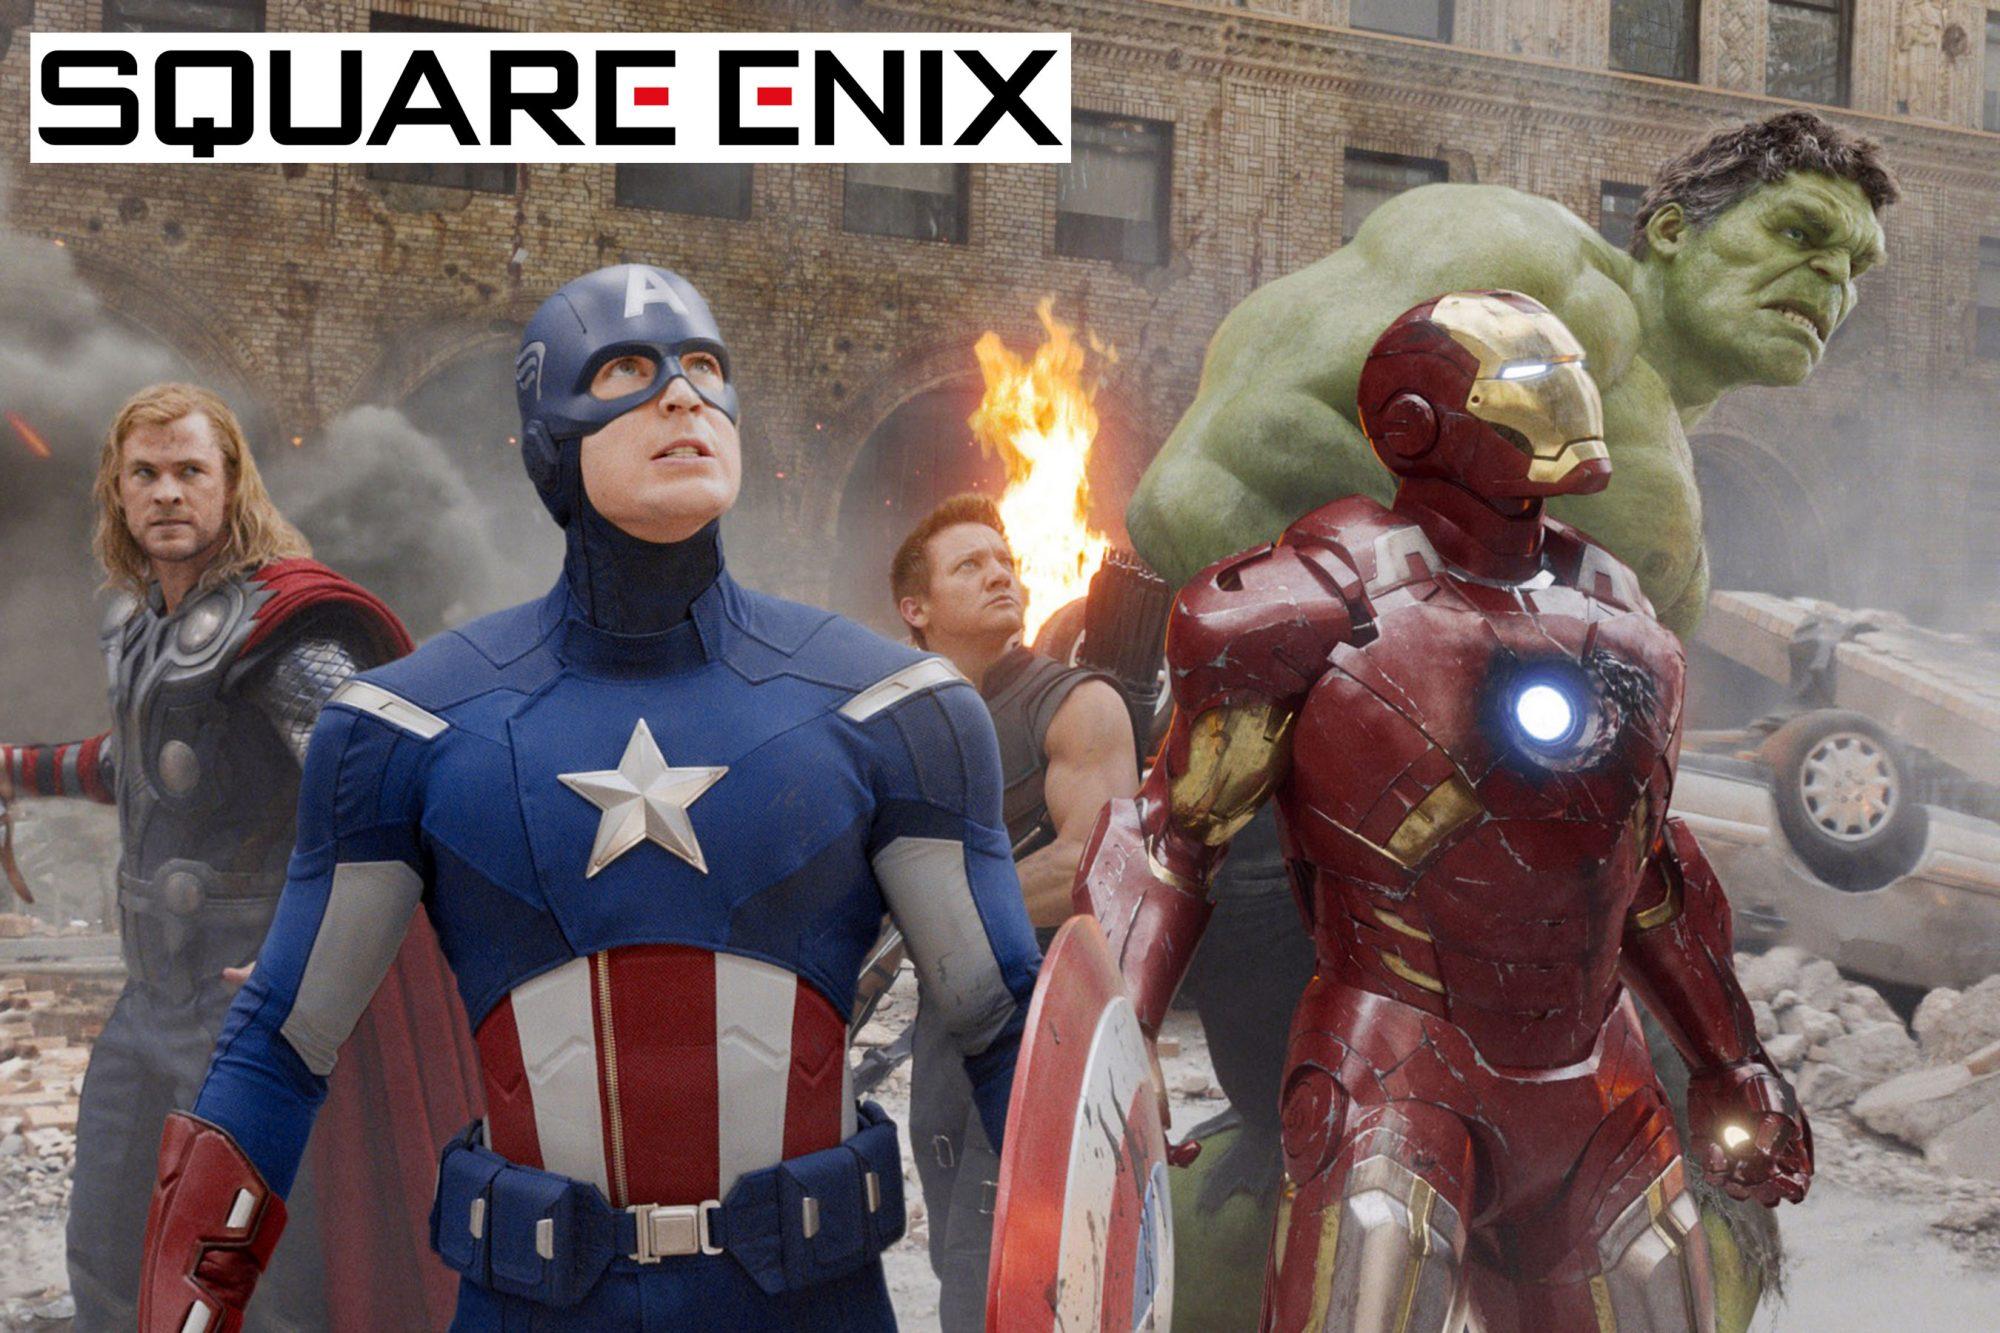 THE AVENGERS, from left: Scarlett Johansson as Black Widow, Chris Hemsworth as Thor, Chris Evans as